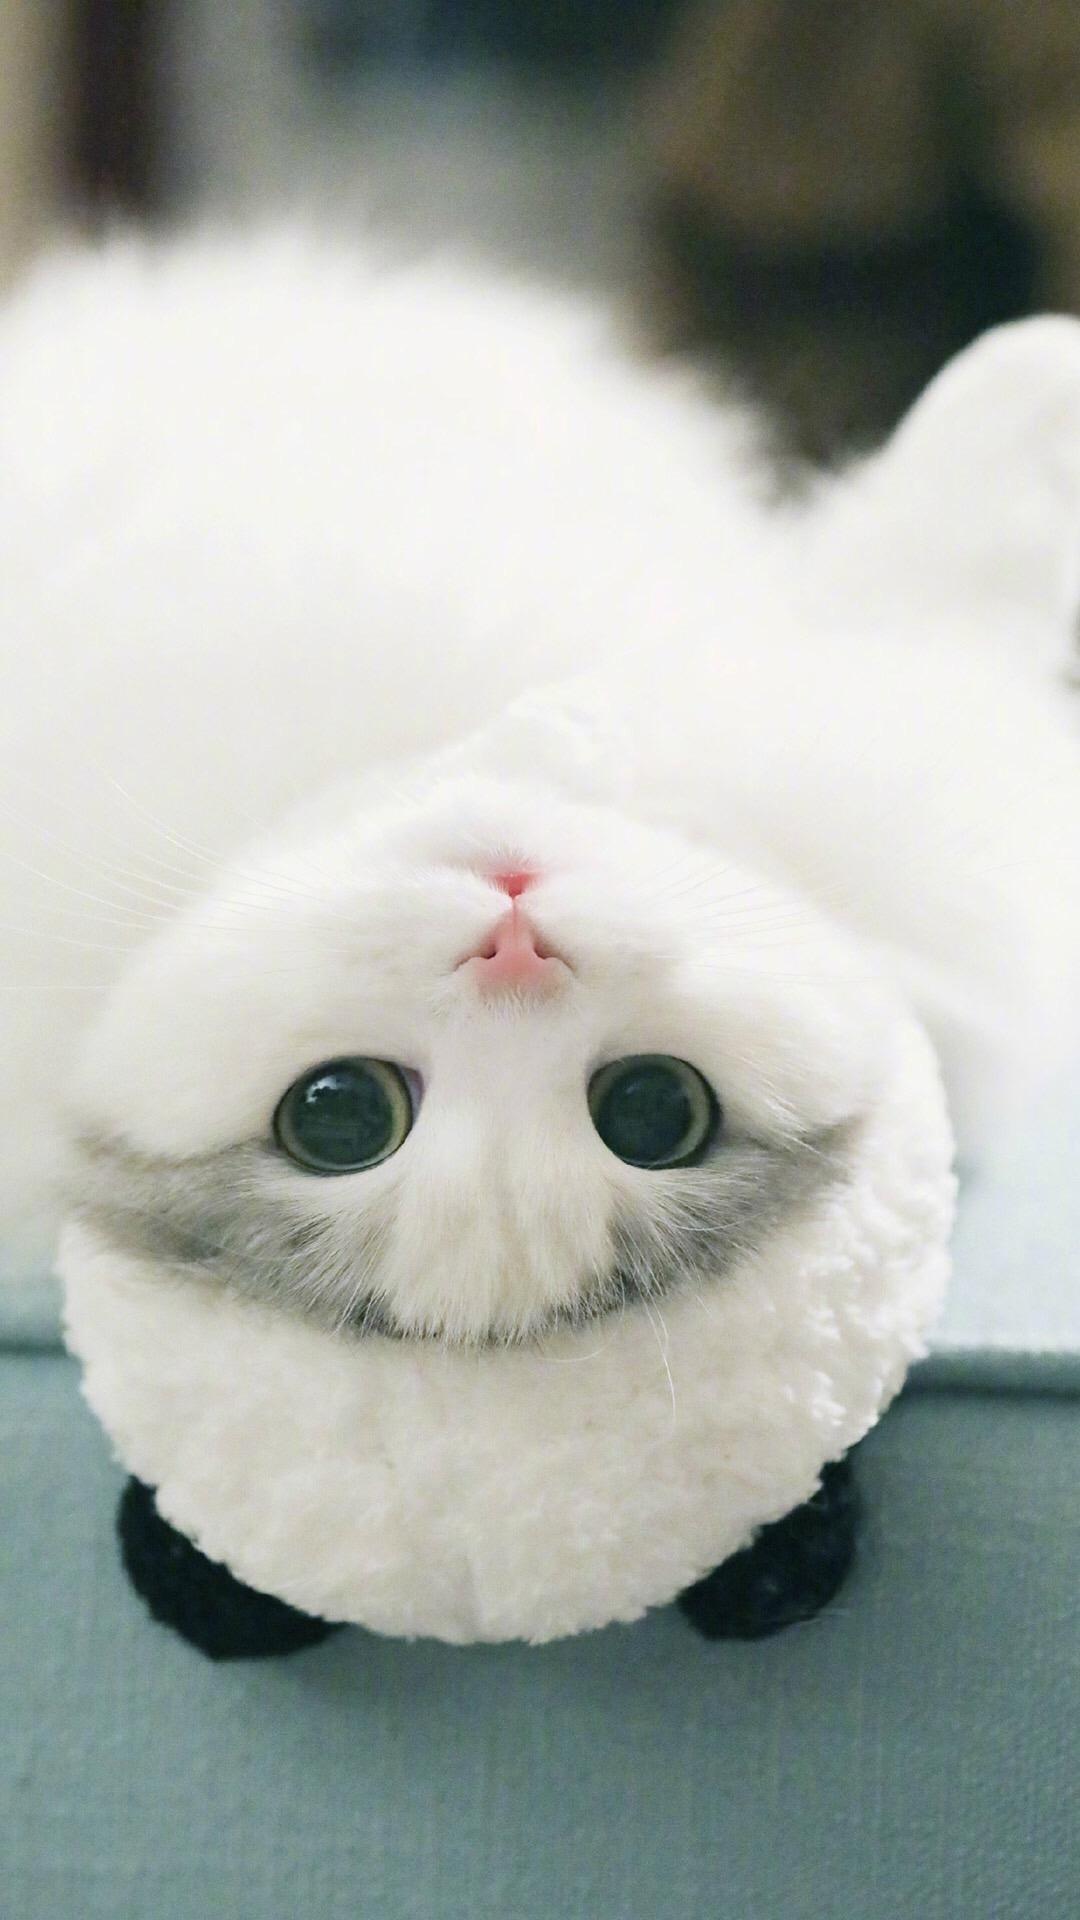 【v粉壁纸】萌萌可爱的小猫咪【9p】